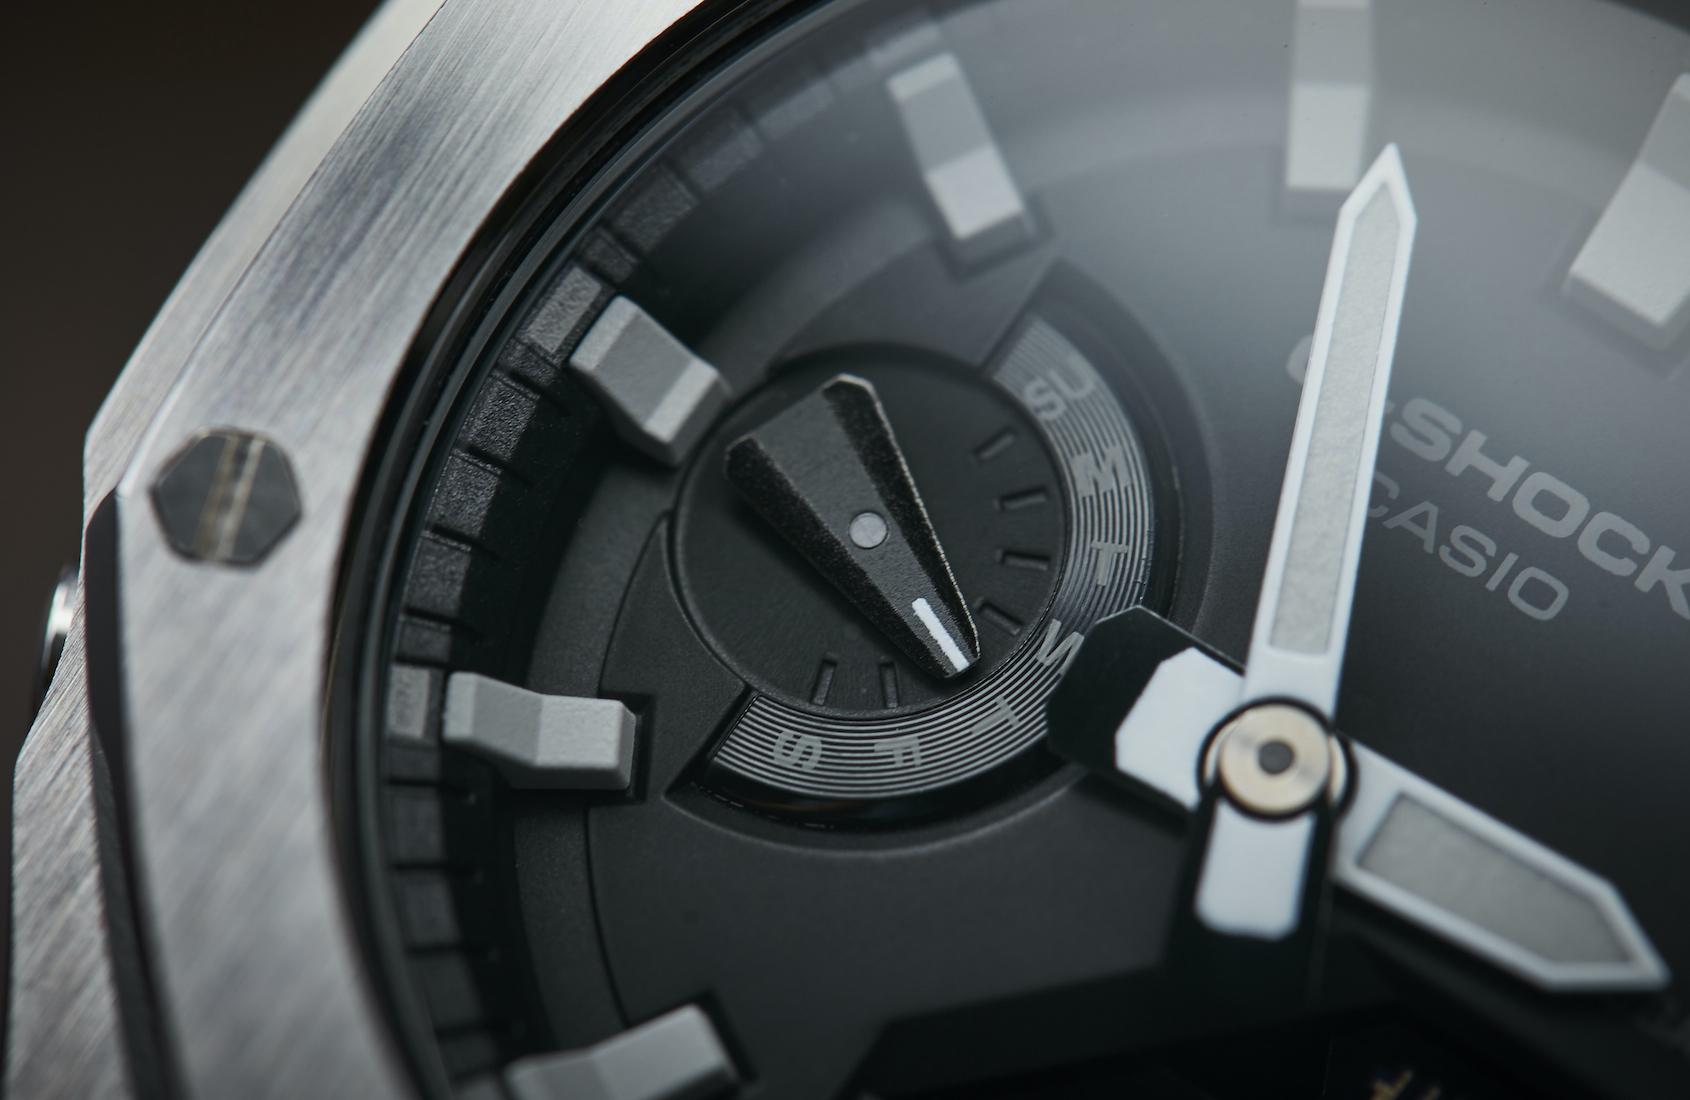 Casio G-Shock mod